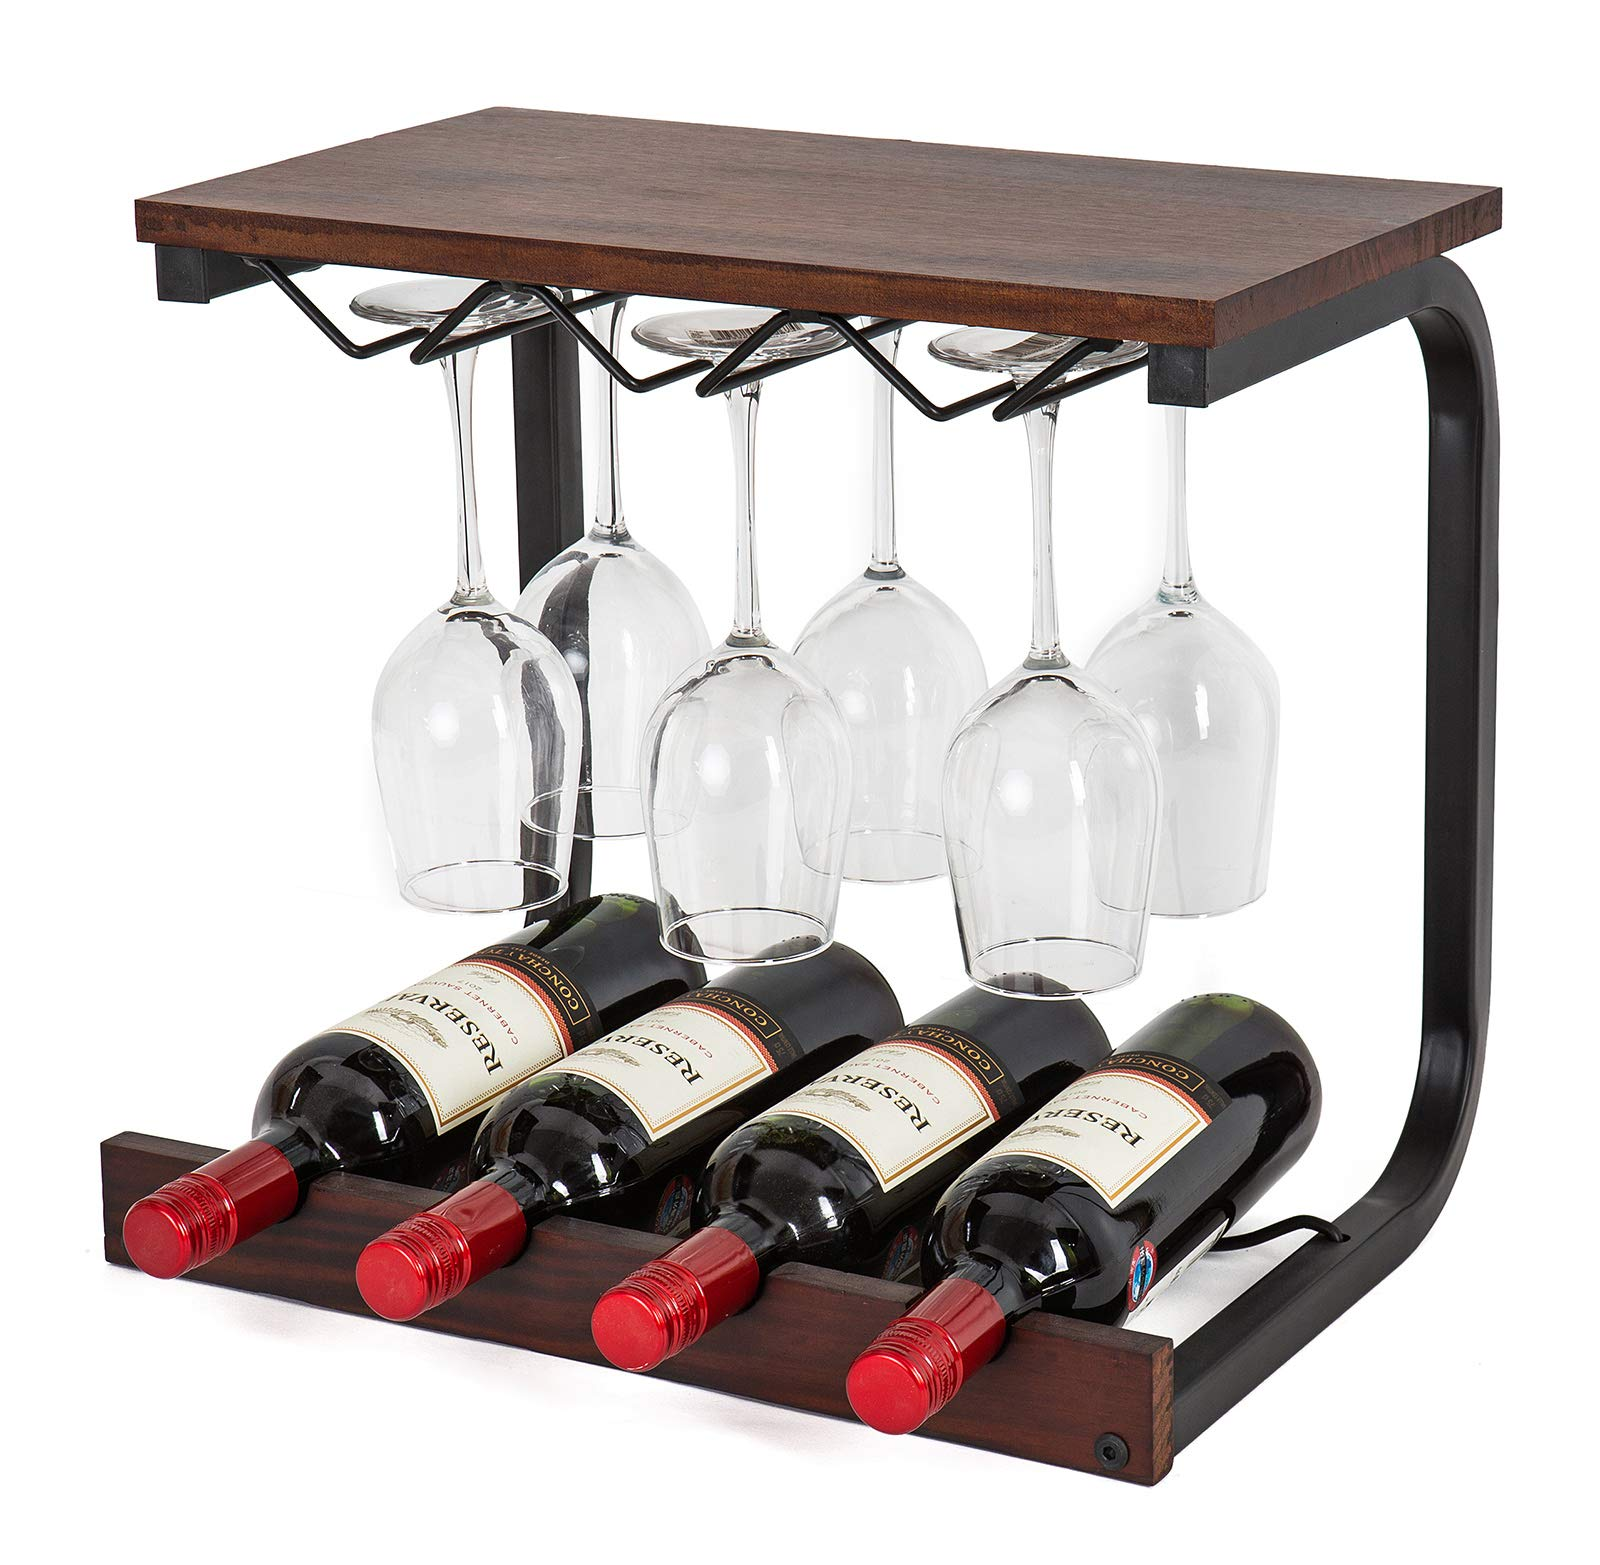 SODUKU Wine Rack Wall Mounted Handmade Metal & Wood Wine Countertop Rack Wine Storage Shelf with 4 Bottle Cages & 6 Long Stem Glass Walnut